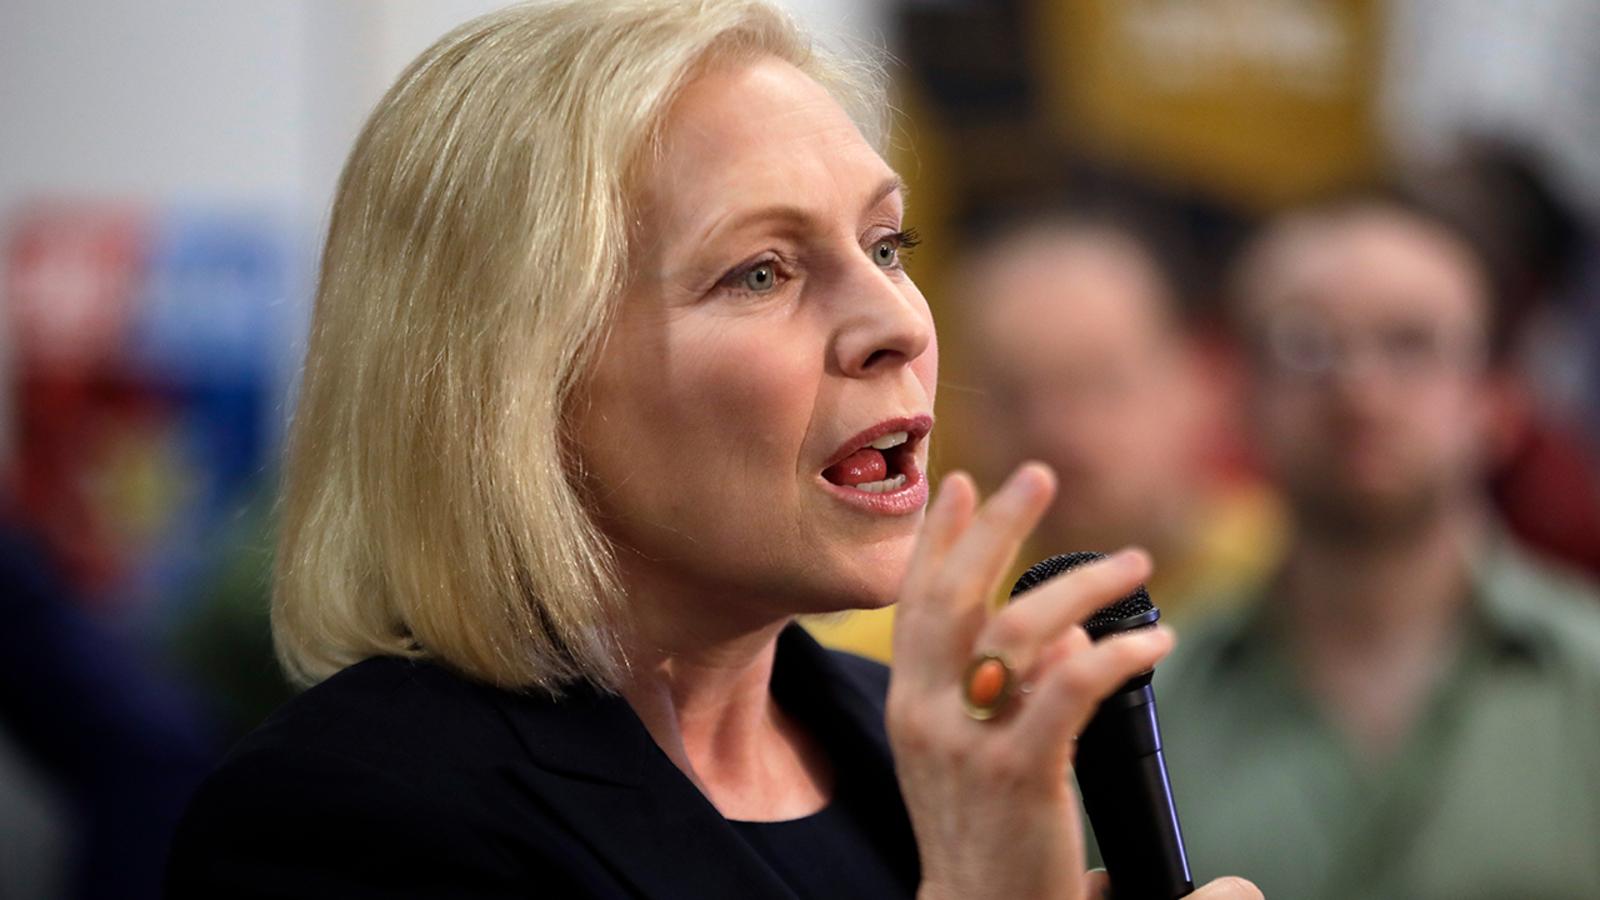 New York Senator Kirsten Gillibrand drops out of 2020 US